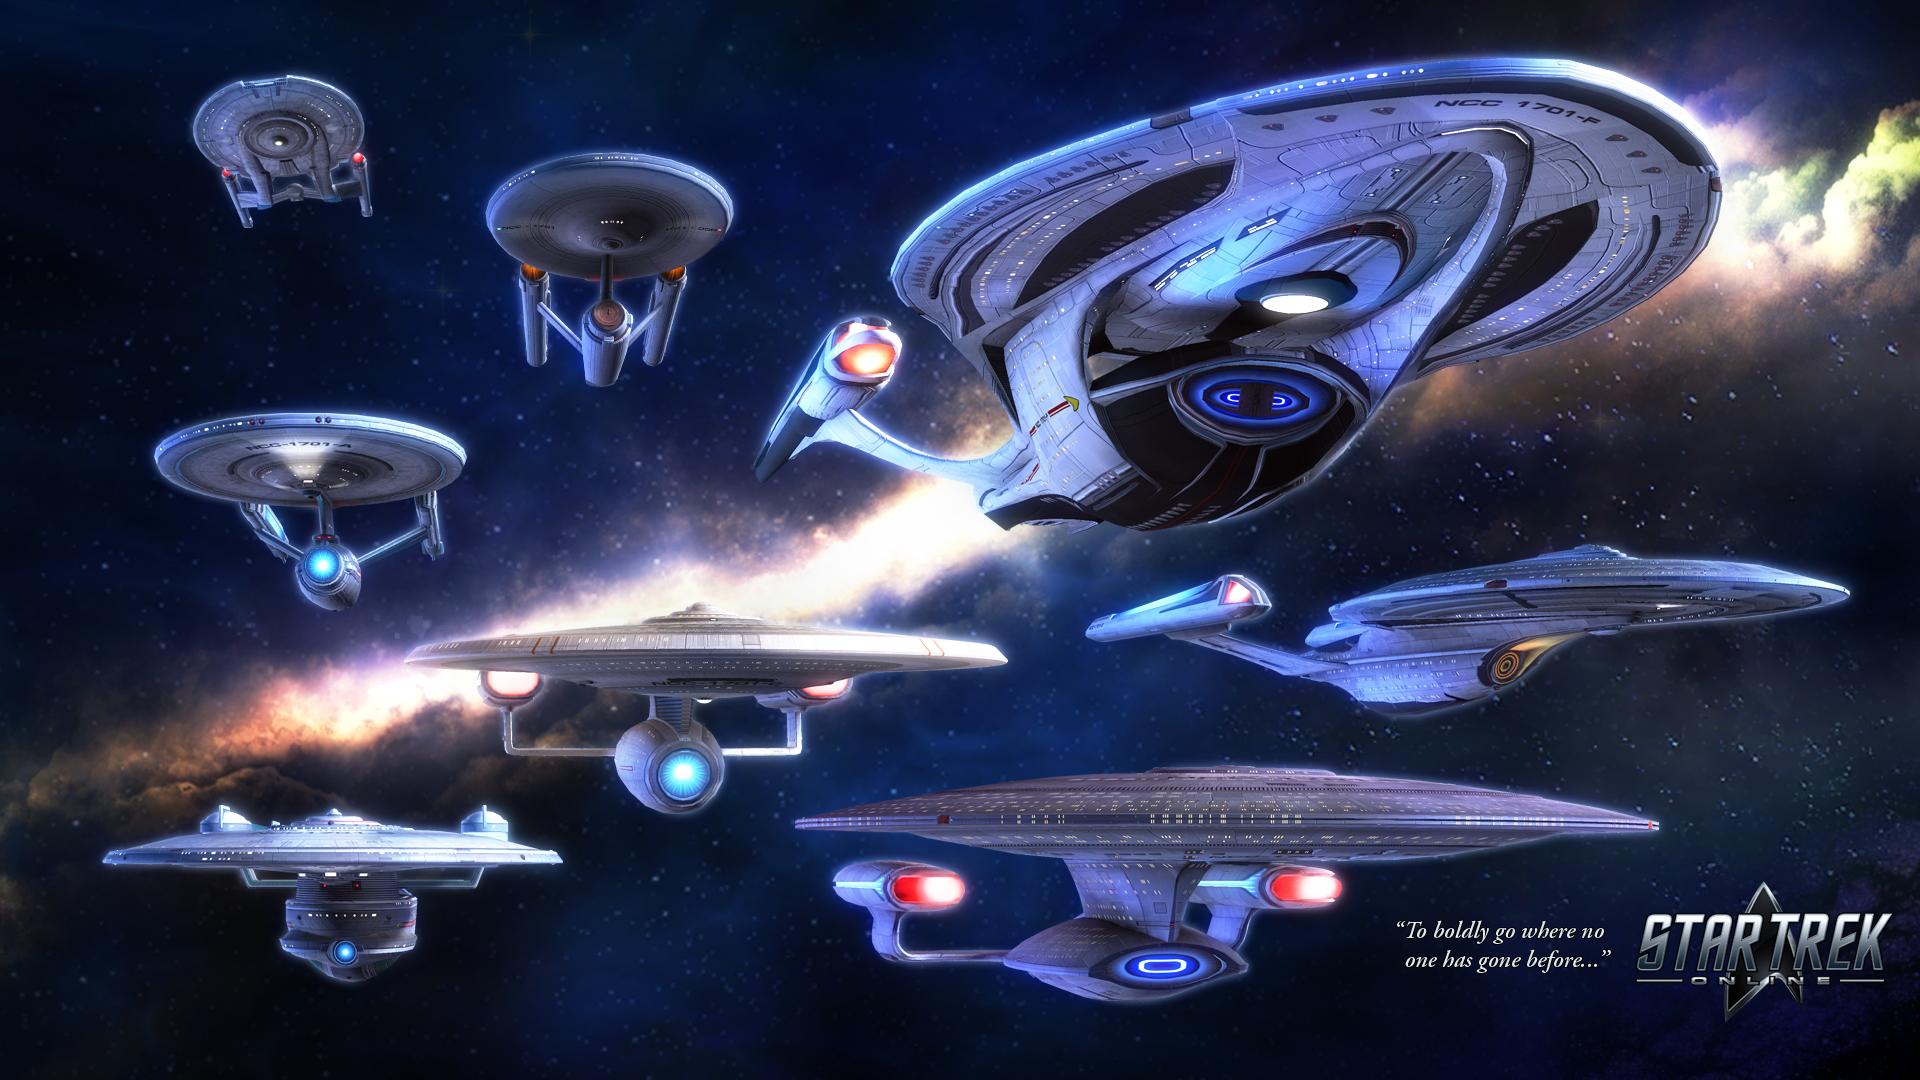 Star Trek Online wallpaper 209792 1920x1080